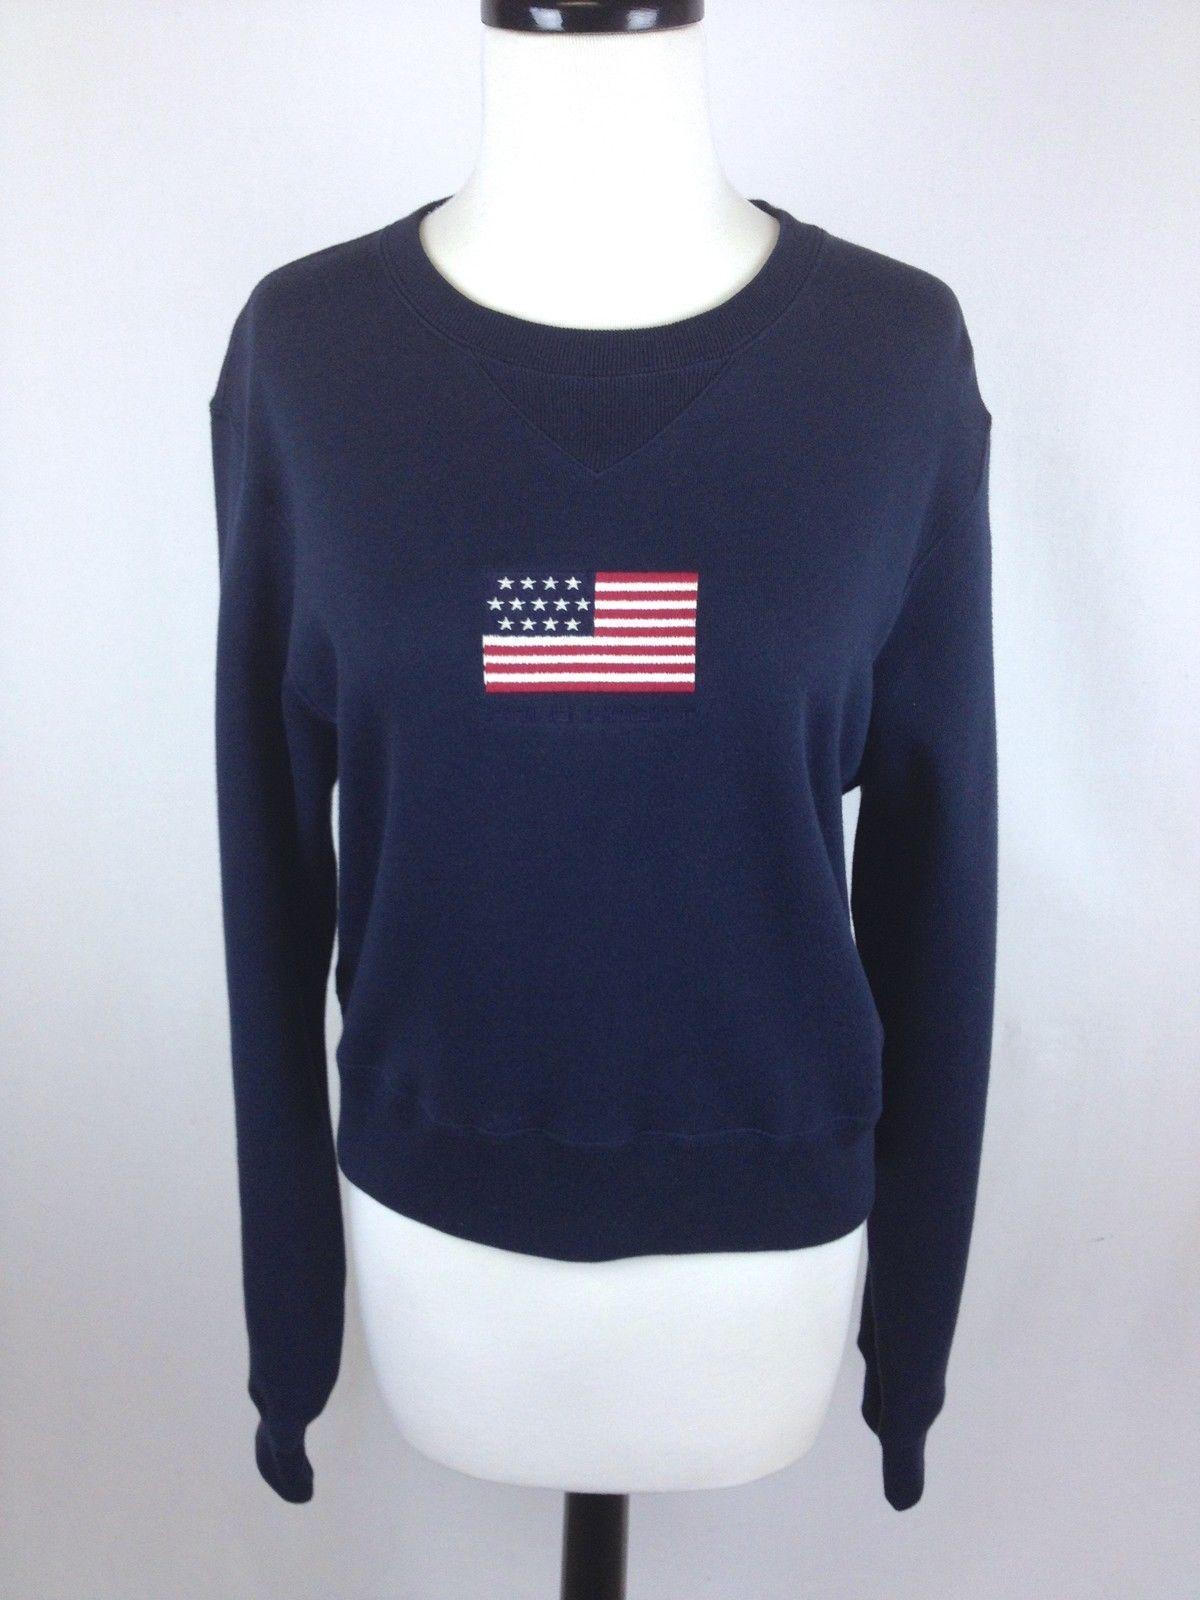 RALPH LAUREN Sweater AMERICAN Flag COTTON Navy Blue POLO SPORT ...